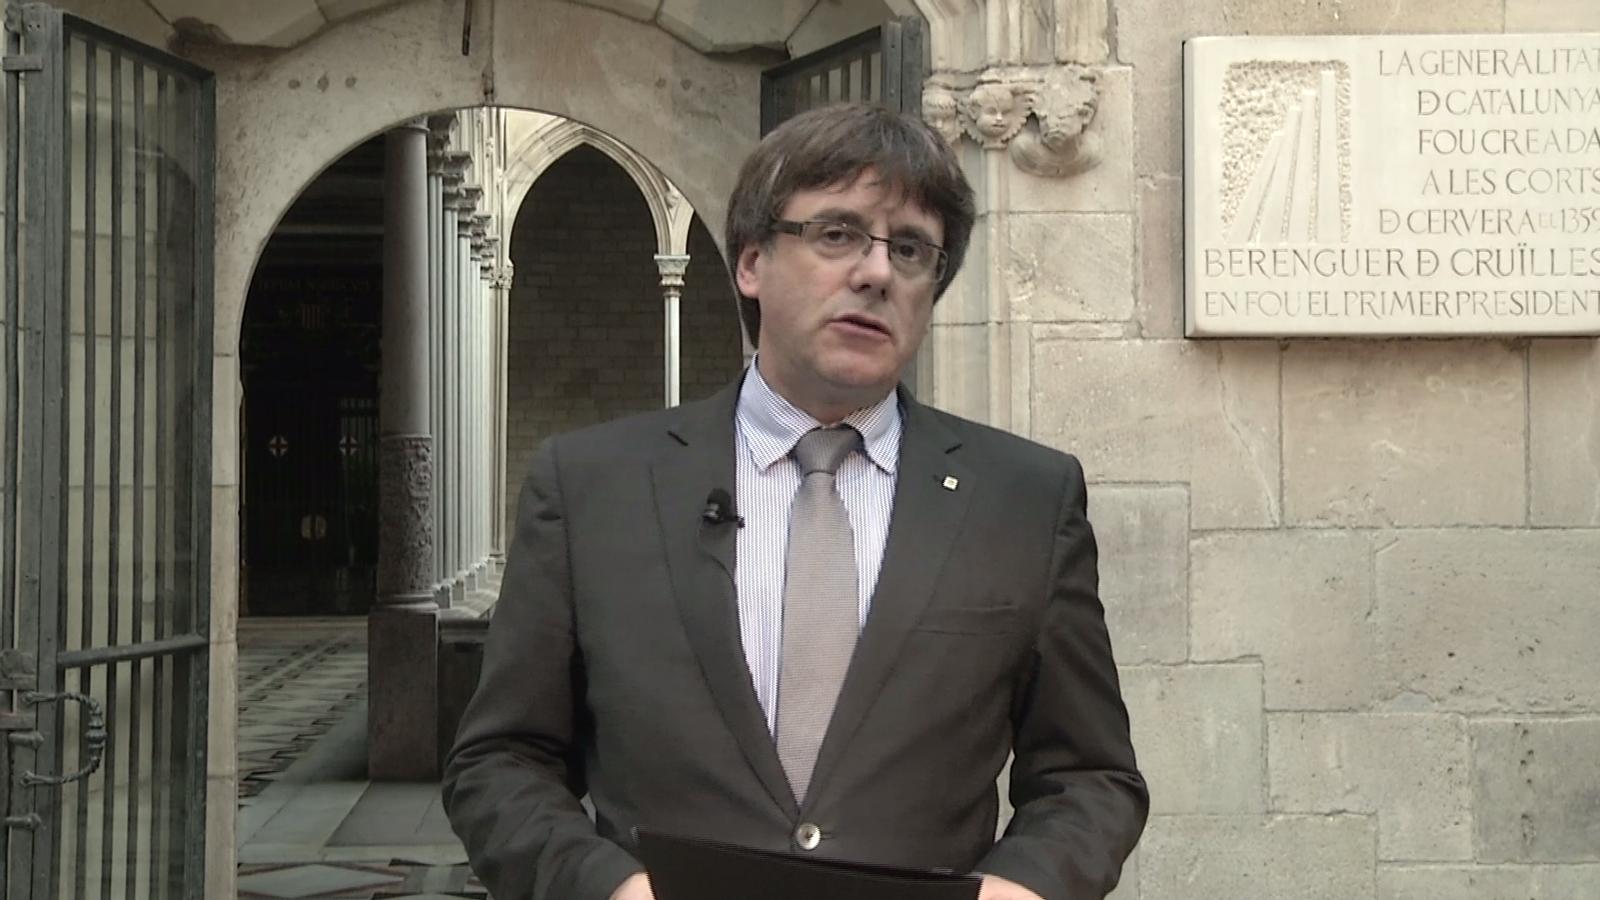 Missatge de Carles Puigdemont